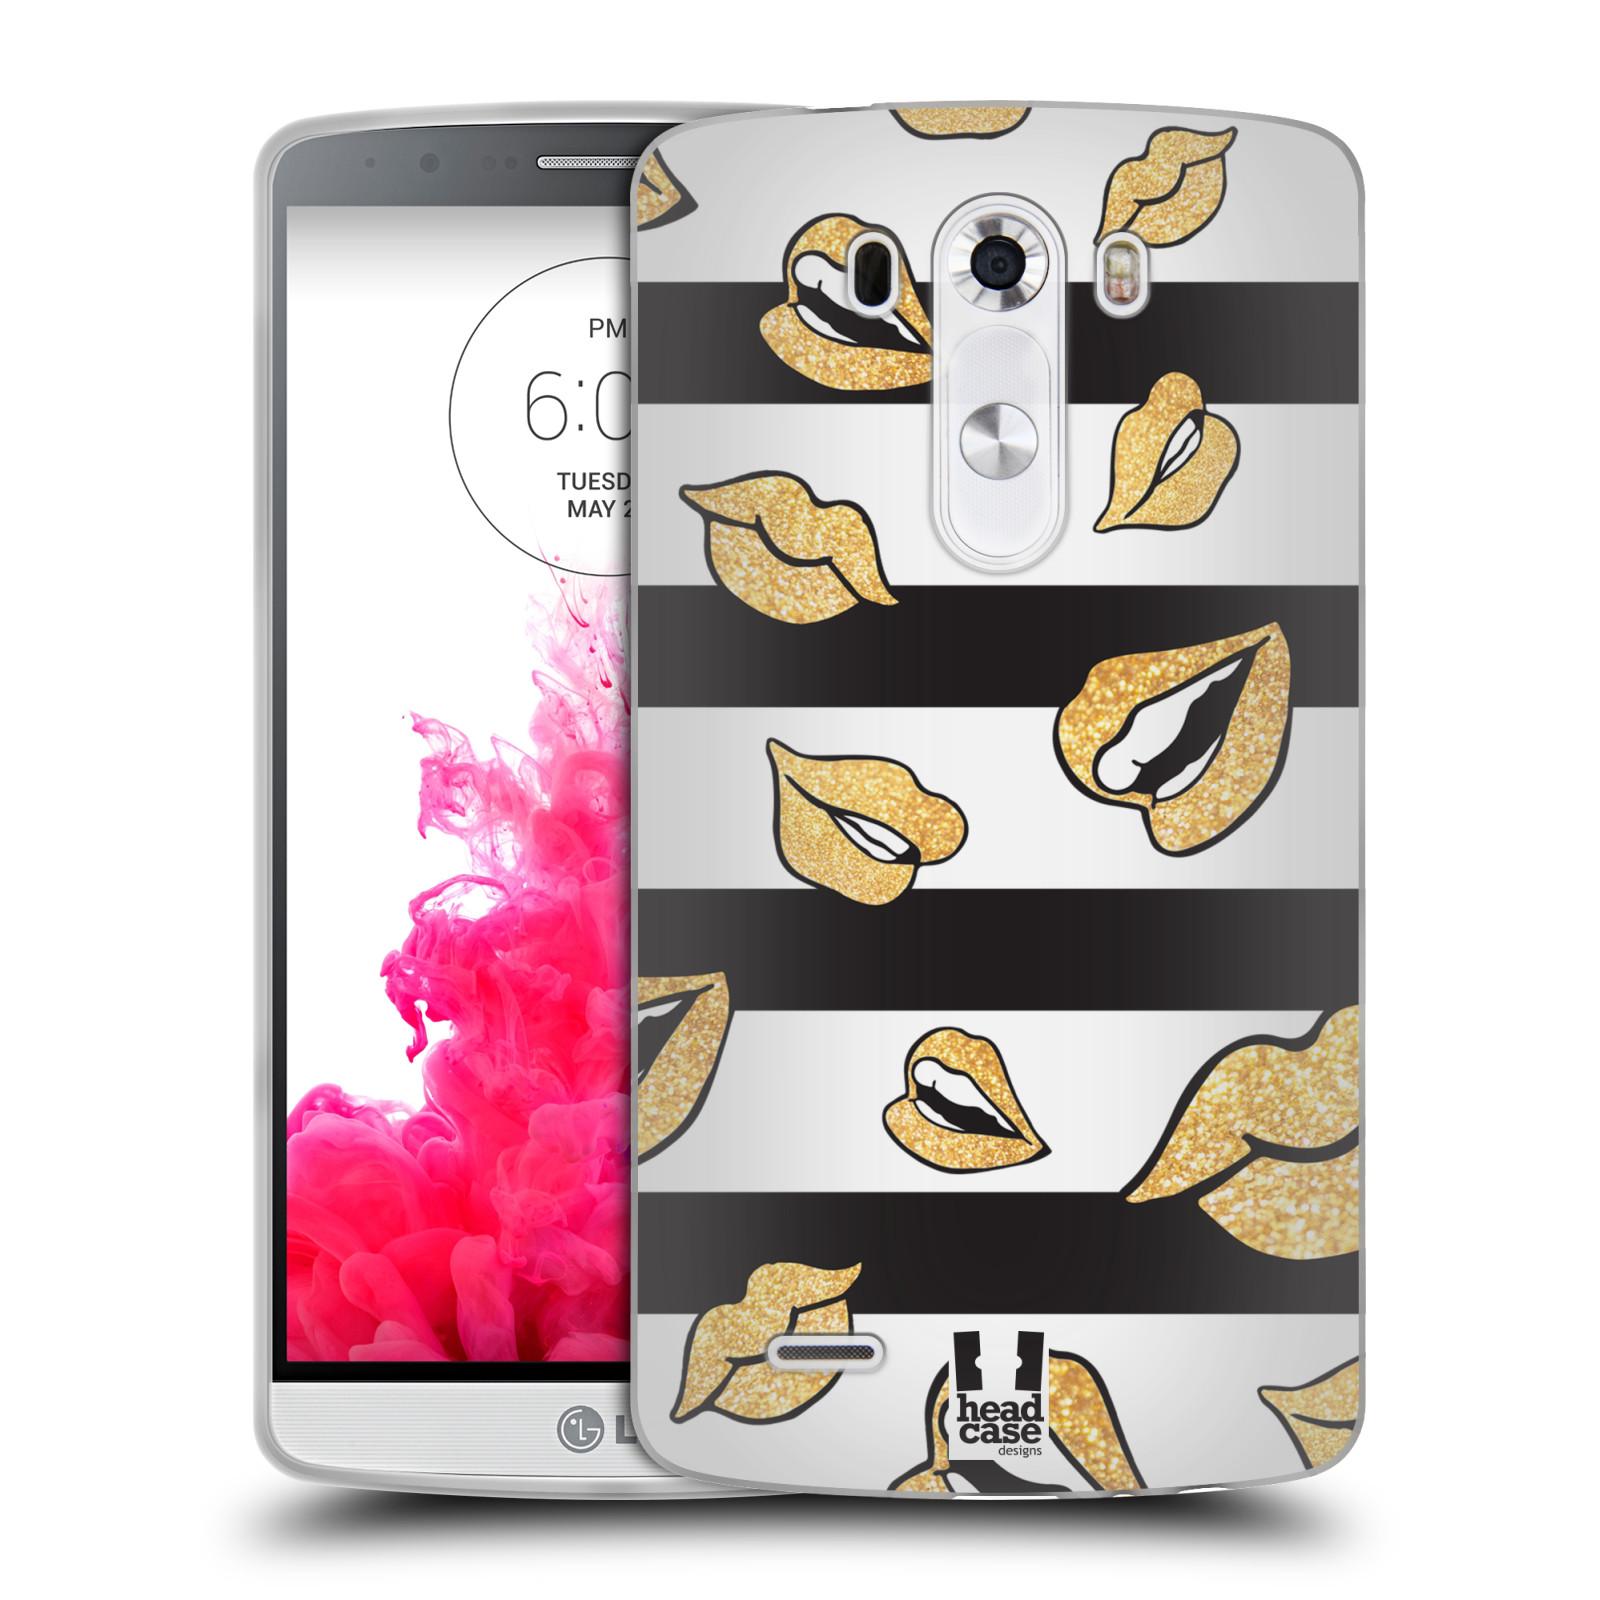 HEAD CASE DESIGNS LIP PATTERNS SOFT GEL CASE FOR LG PHONES 1